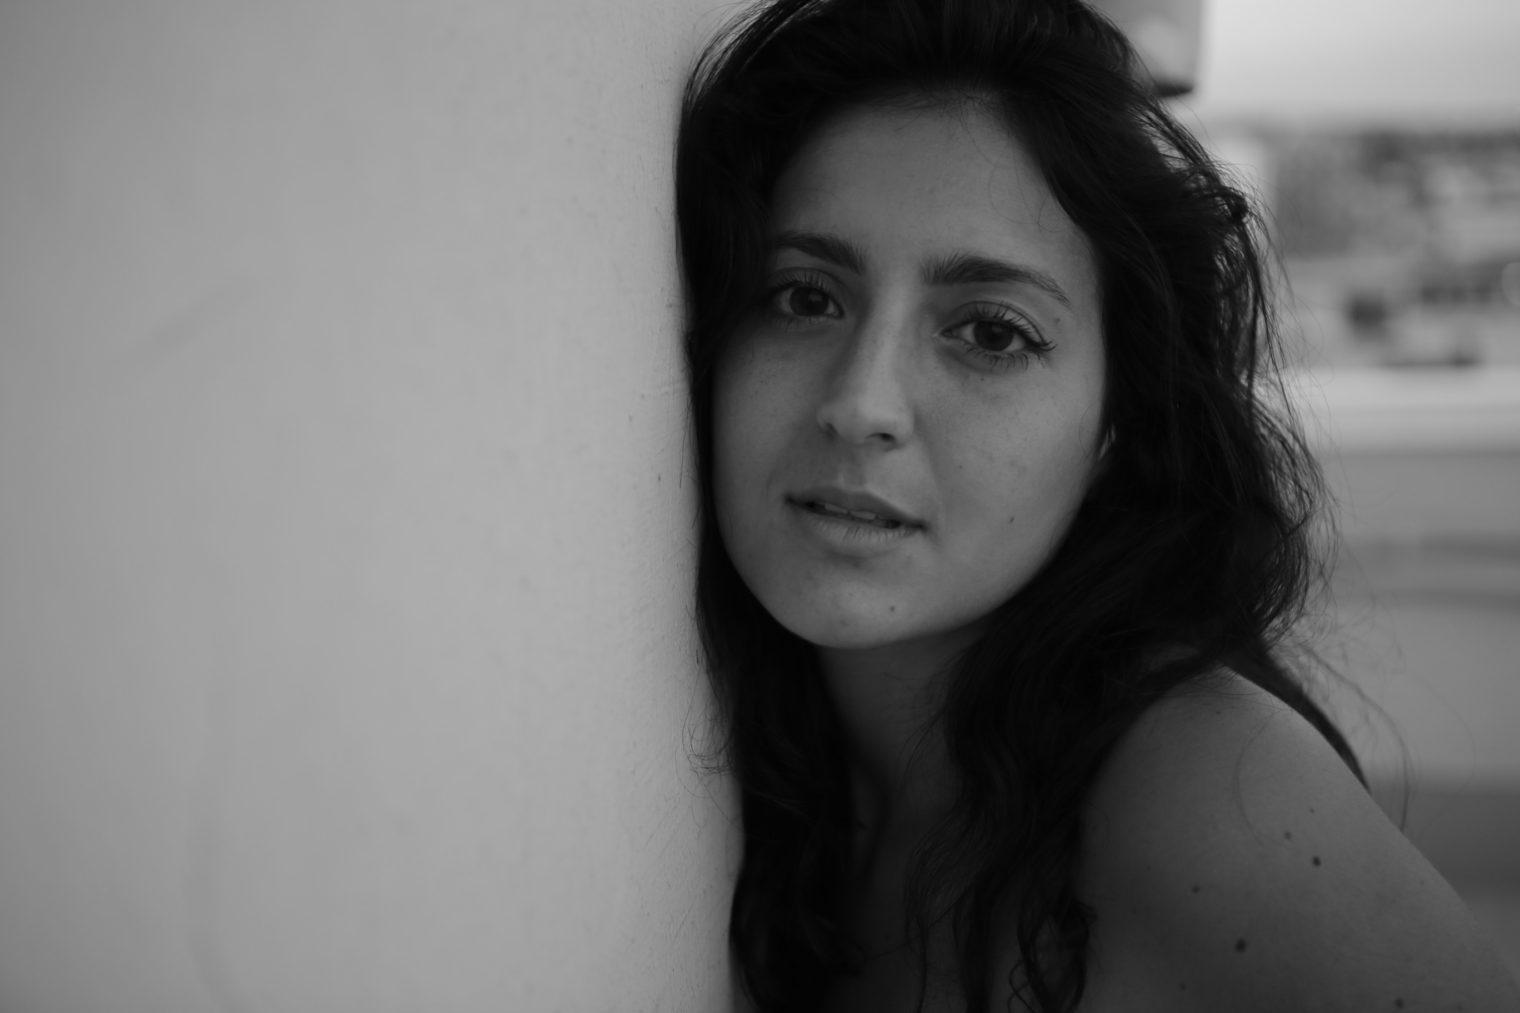 rhamely fotografa | caroselling | studio creativo mantova | web design e comunicazione